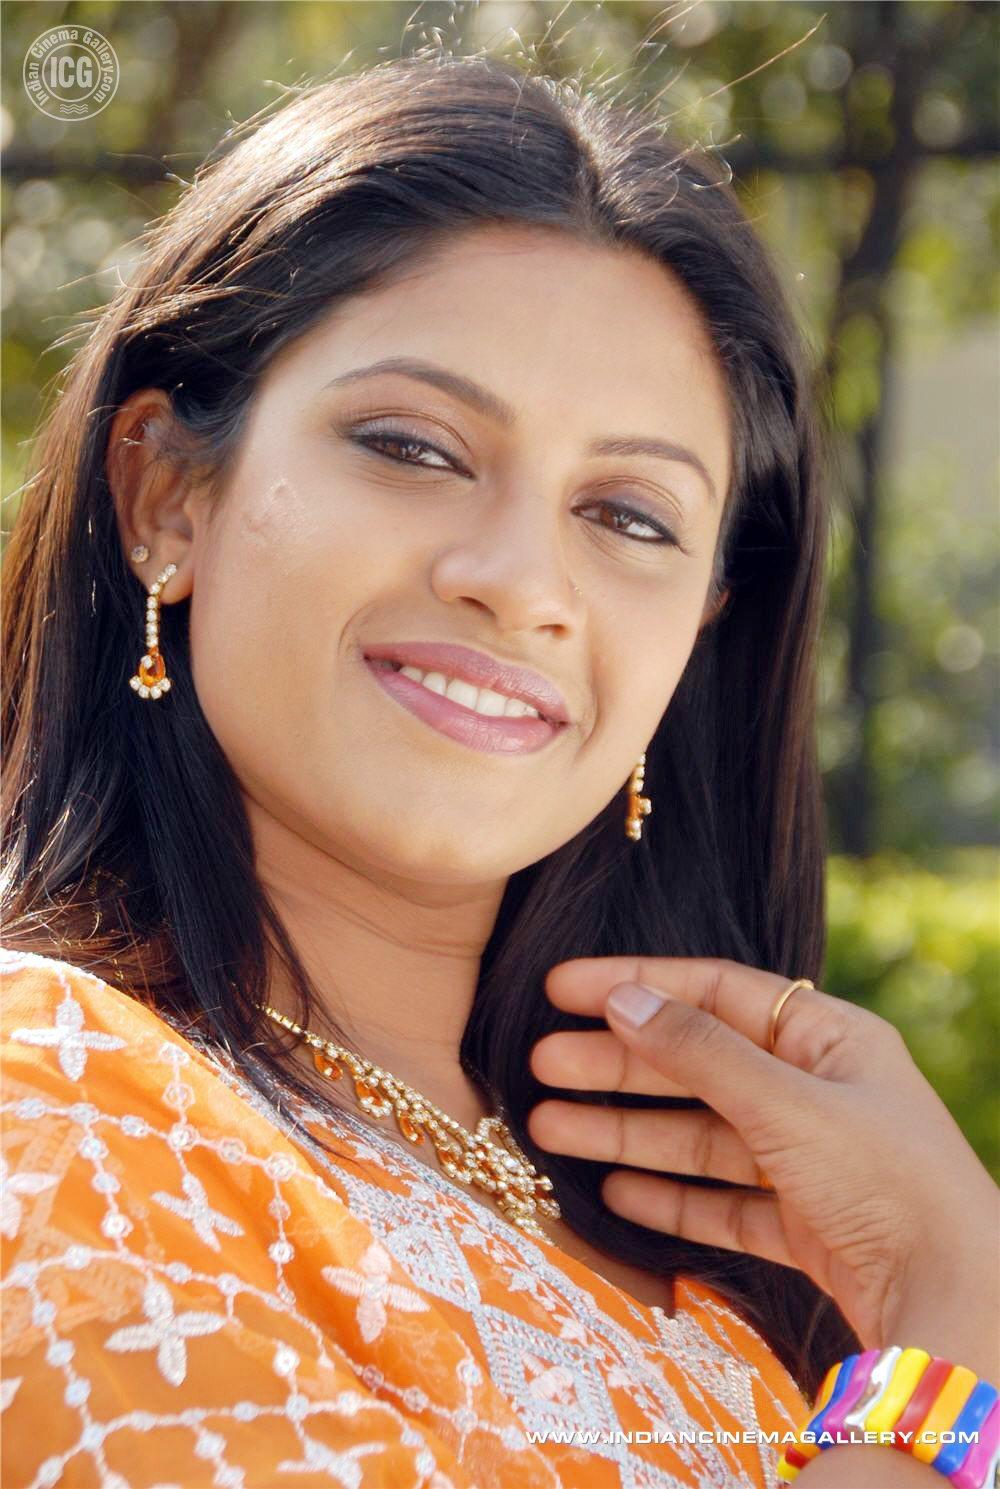 Amusing information Malayalam actress meera tv correctly